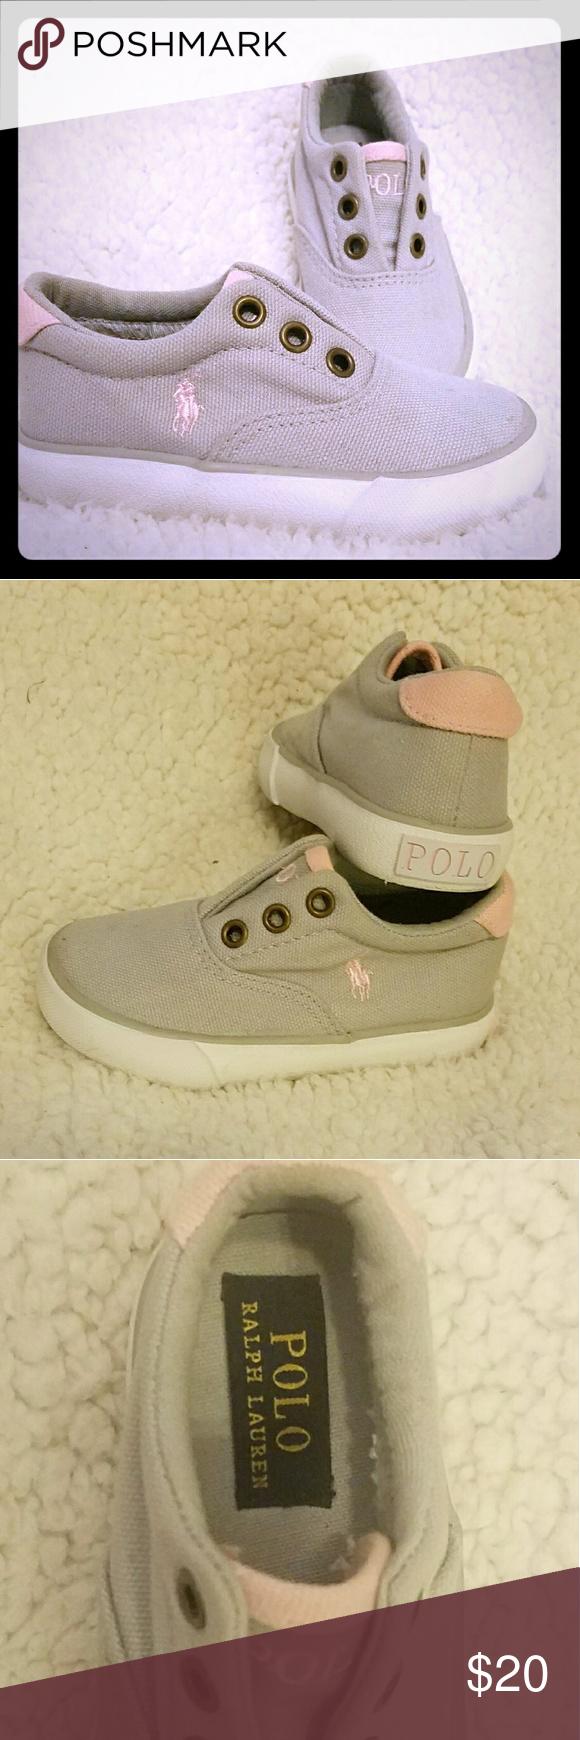 Picks ShoesMy Posh Size Ralph Girl Polo 6 Lauren Canvas m8y0OvNnw